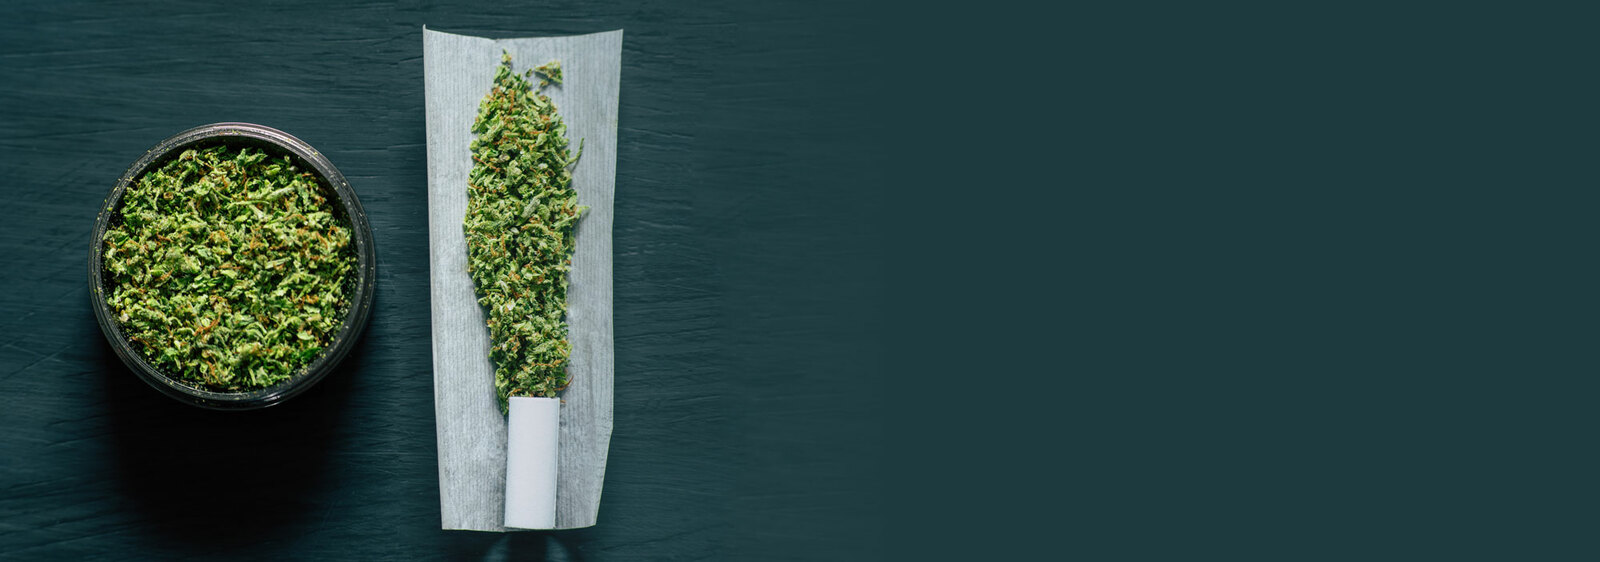 cannabis-background